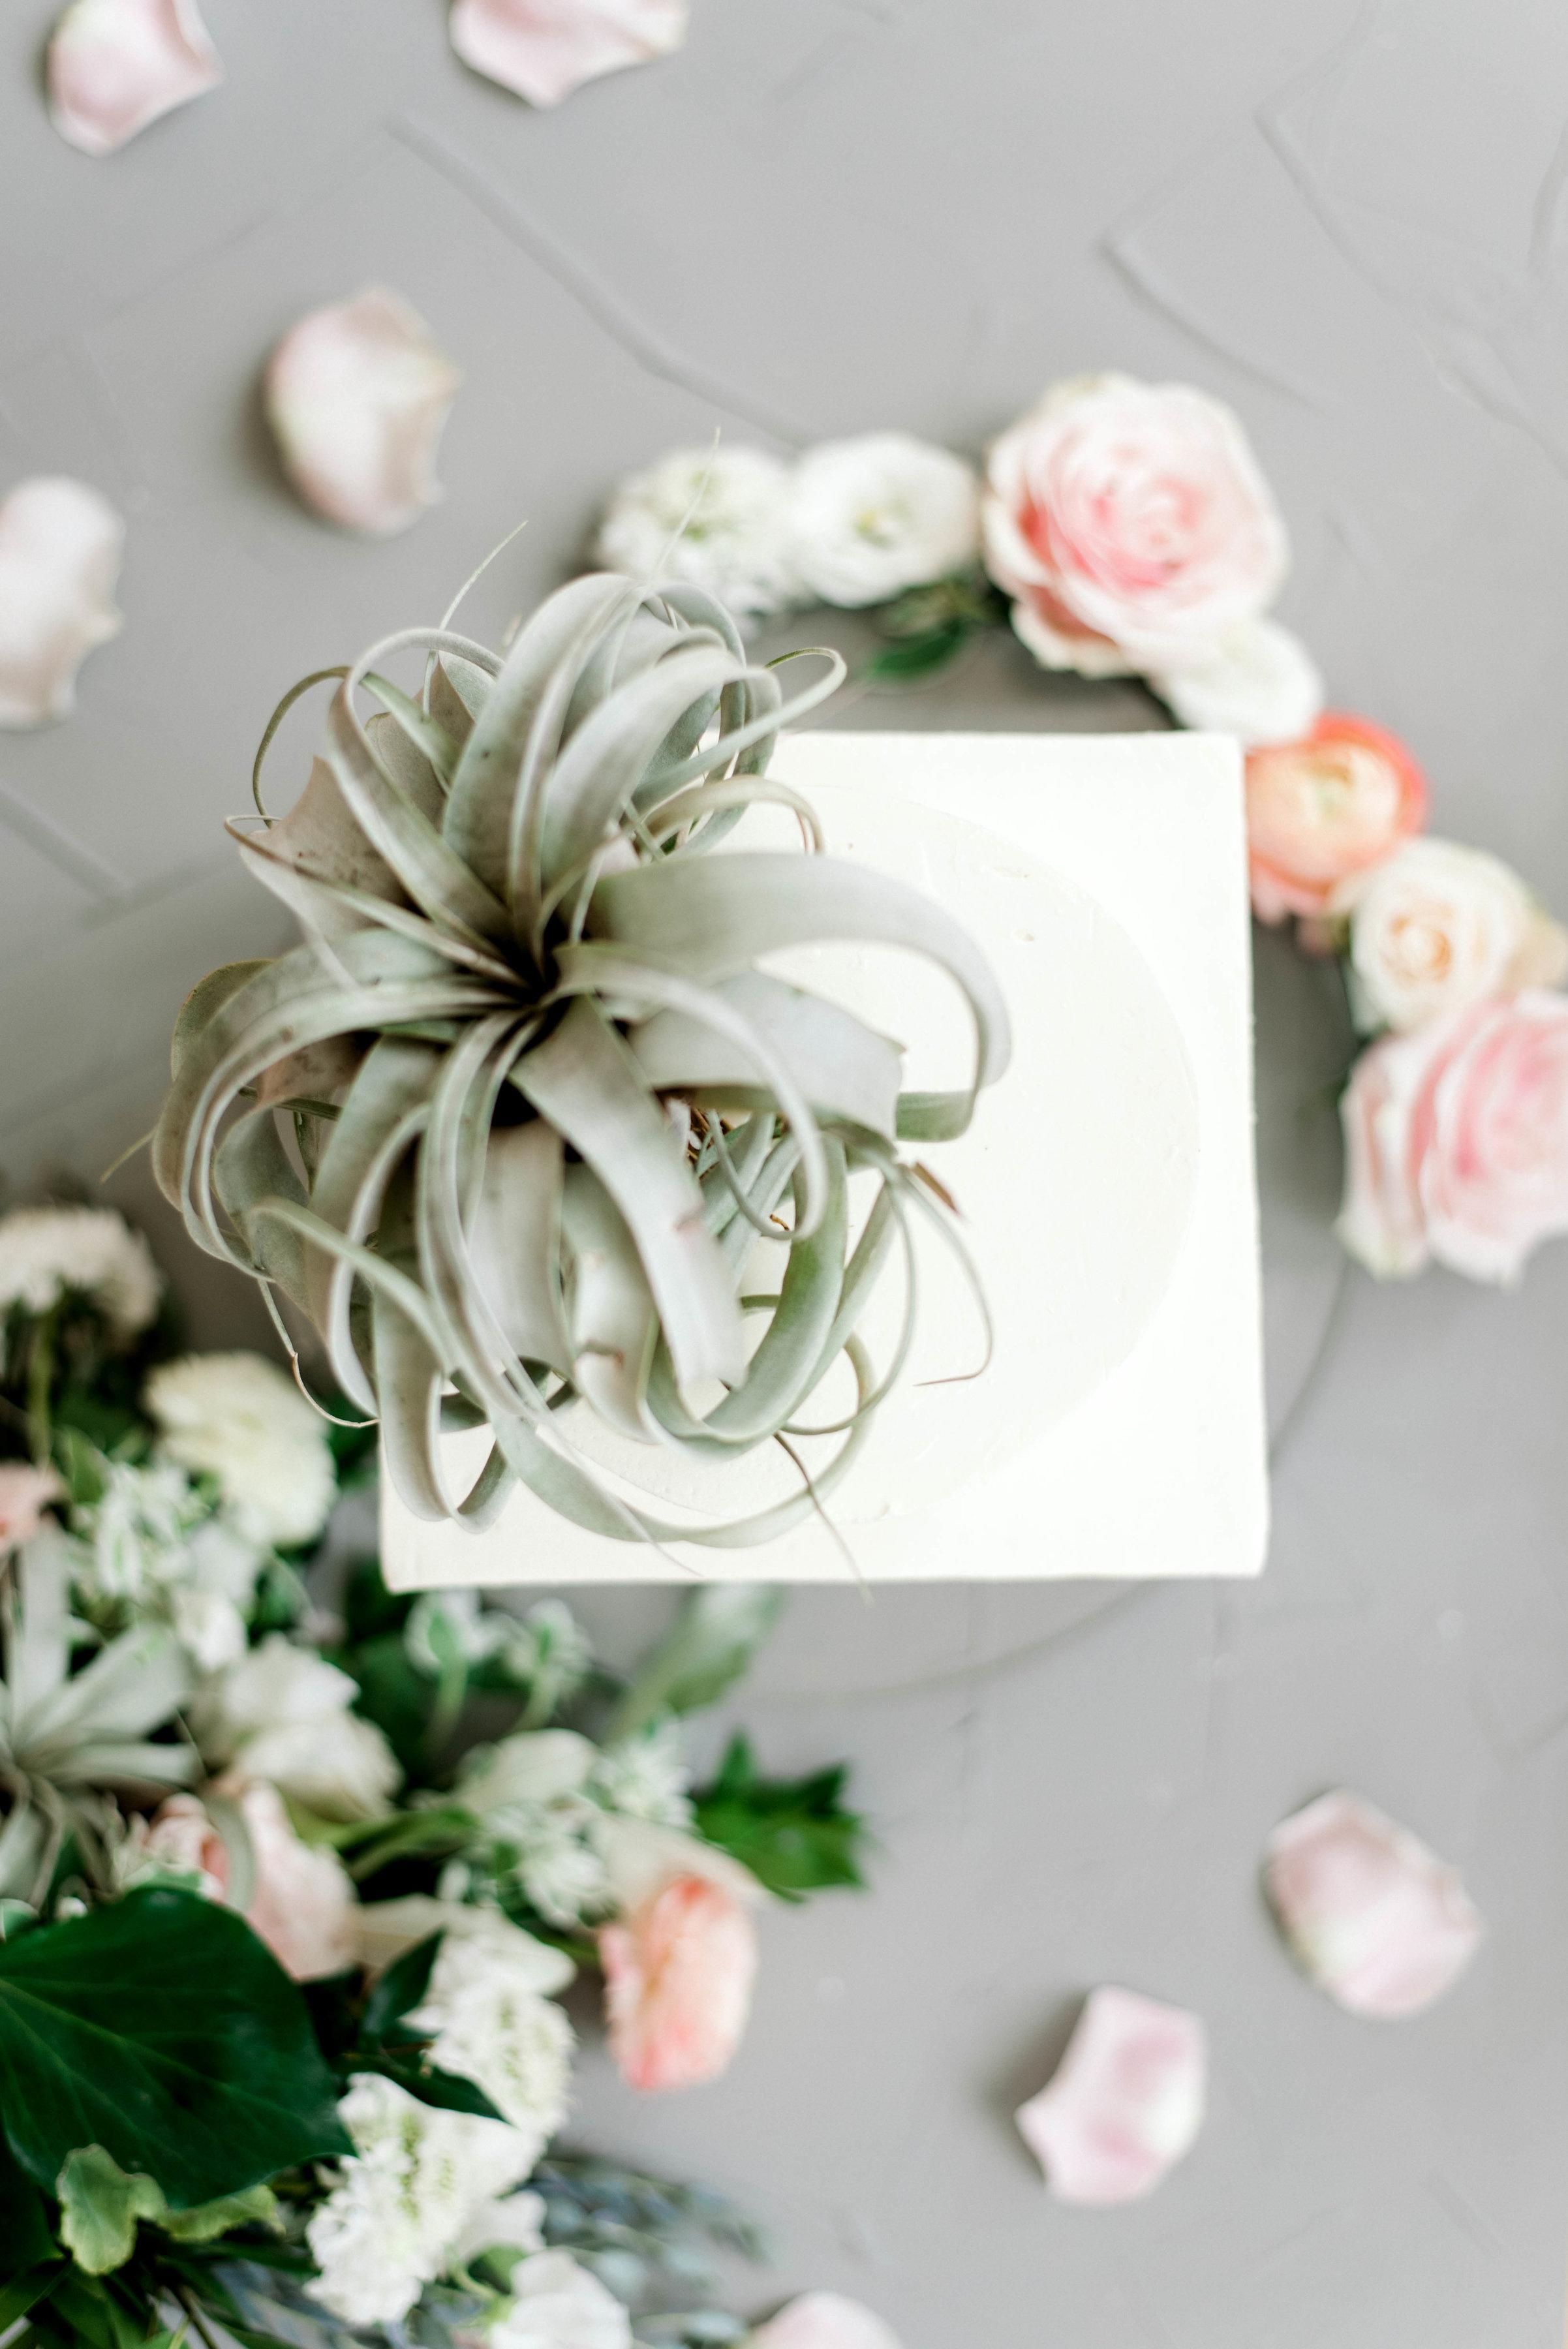 Lyons-Events-Hombre-Air-Plant-Wedding-Cake